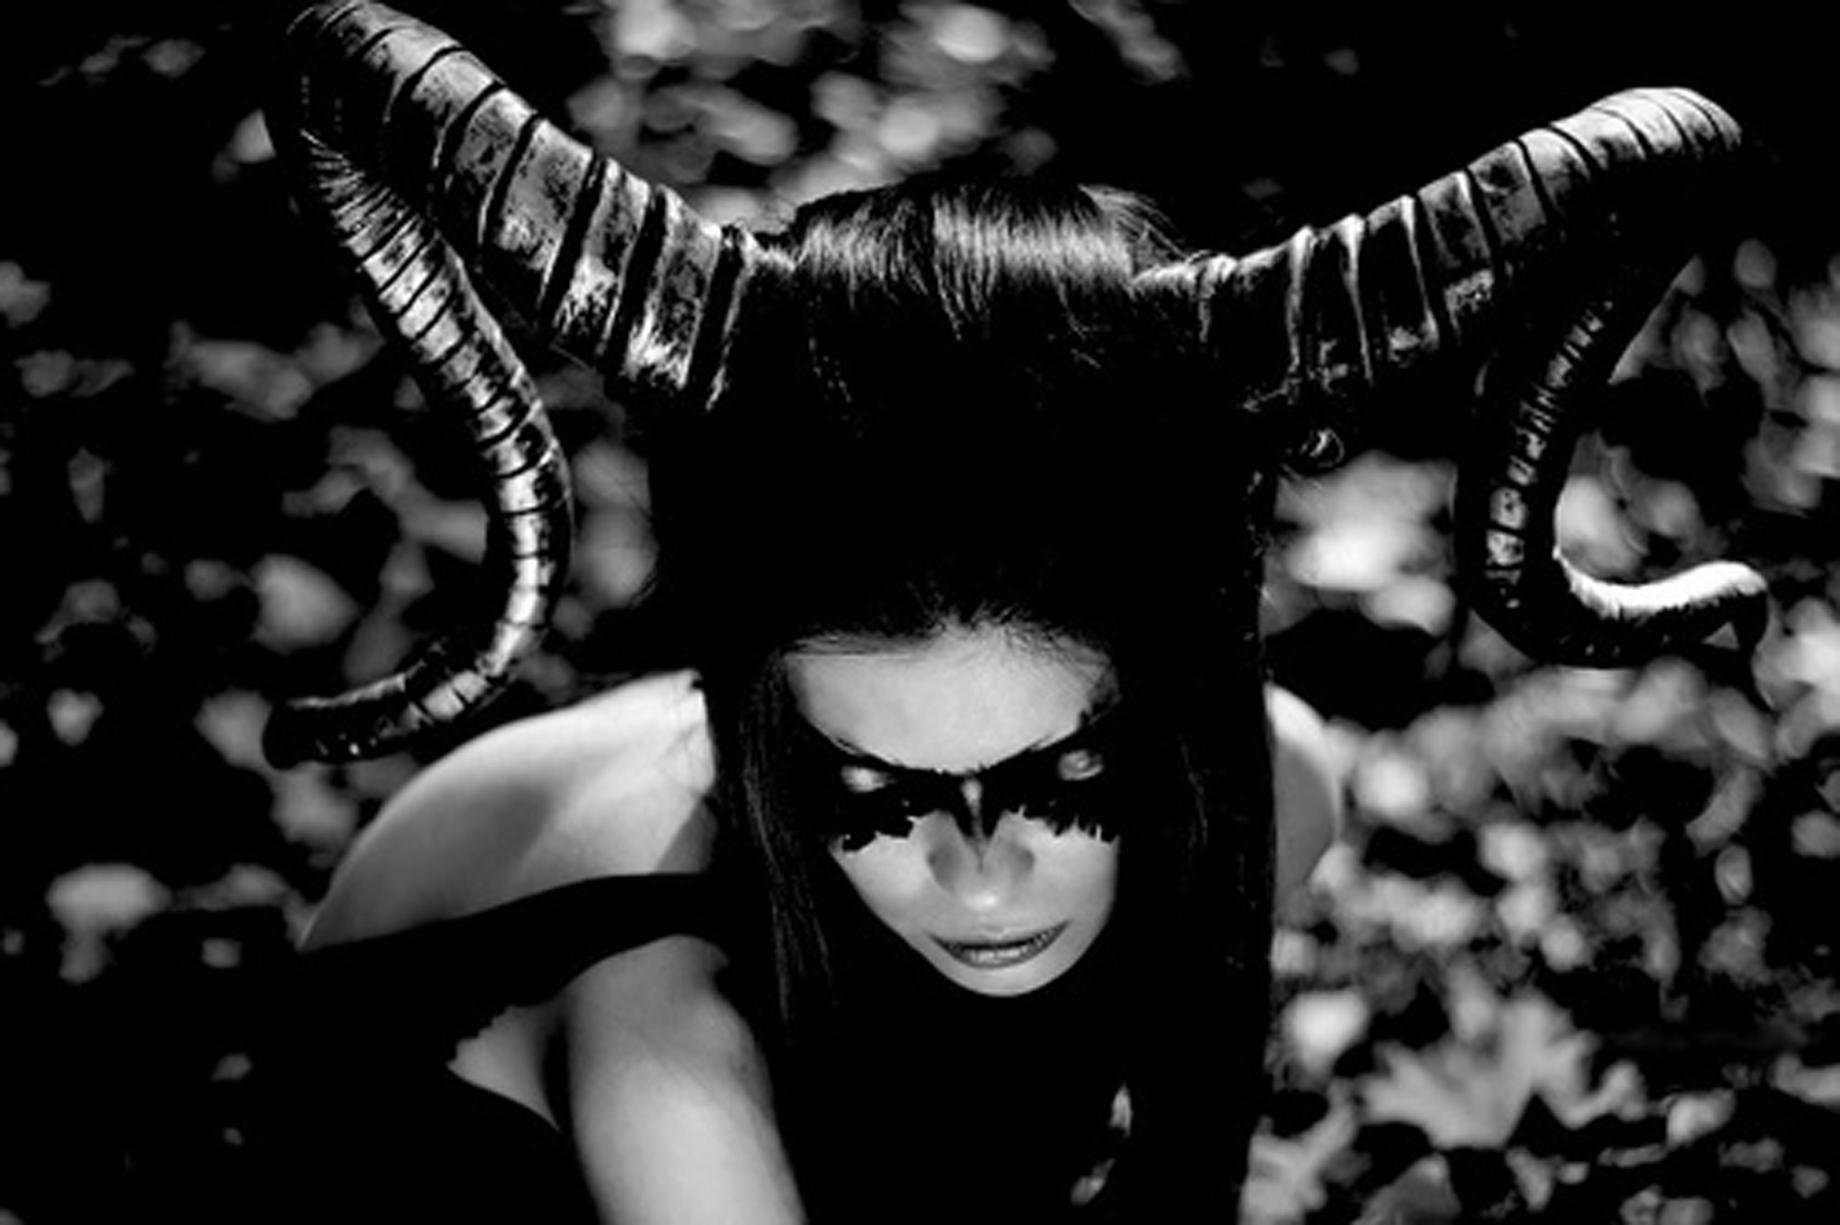 Демоны девочки фото